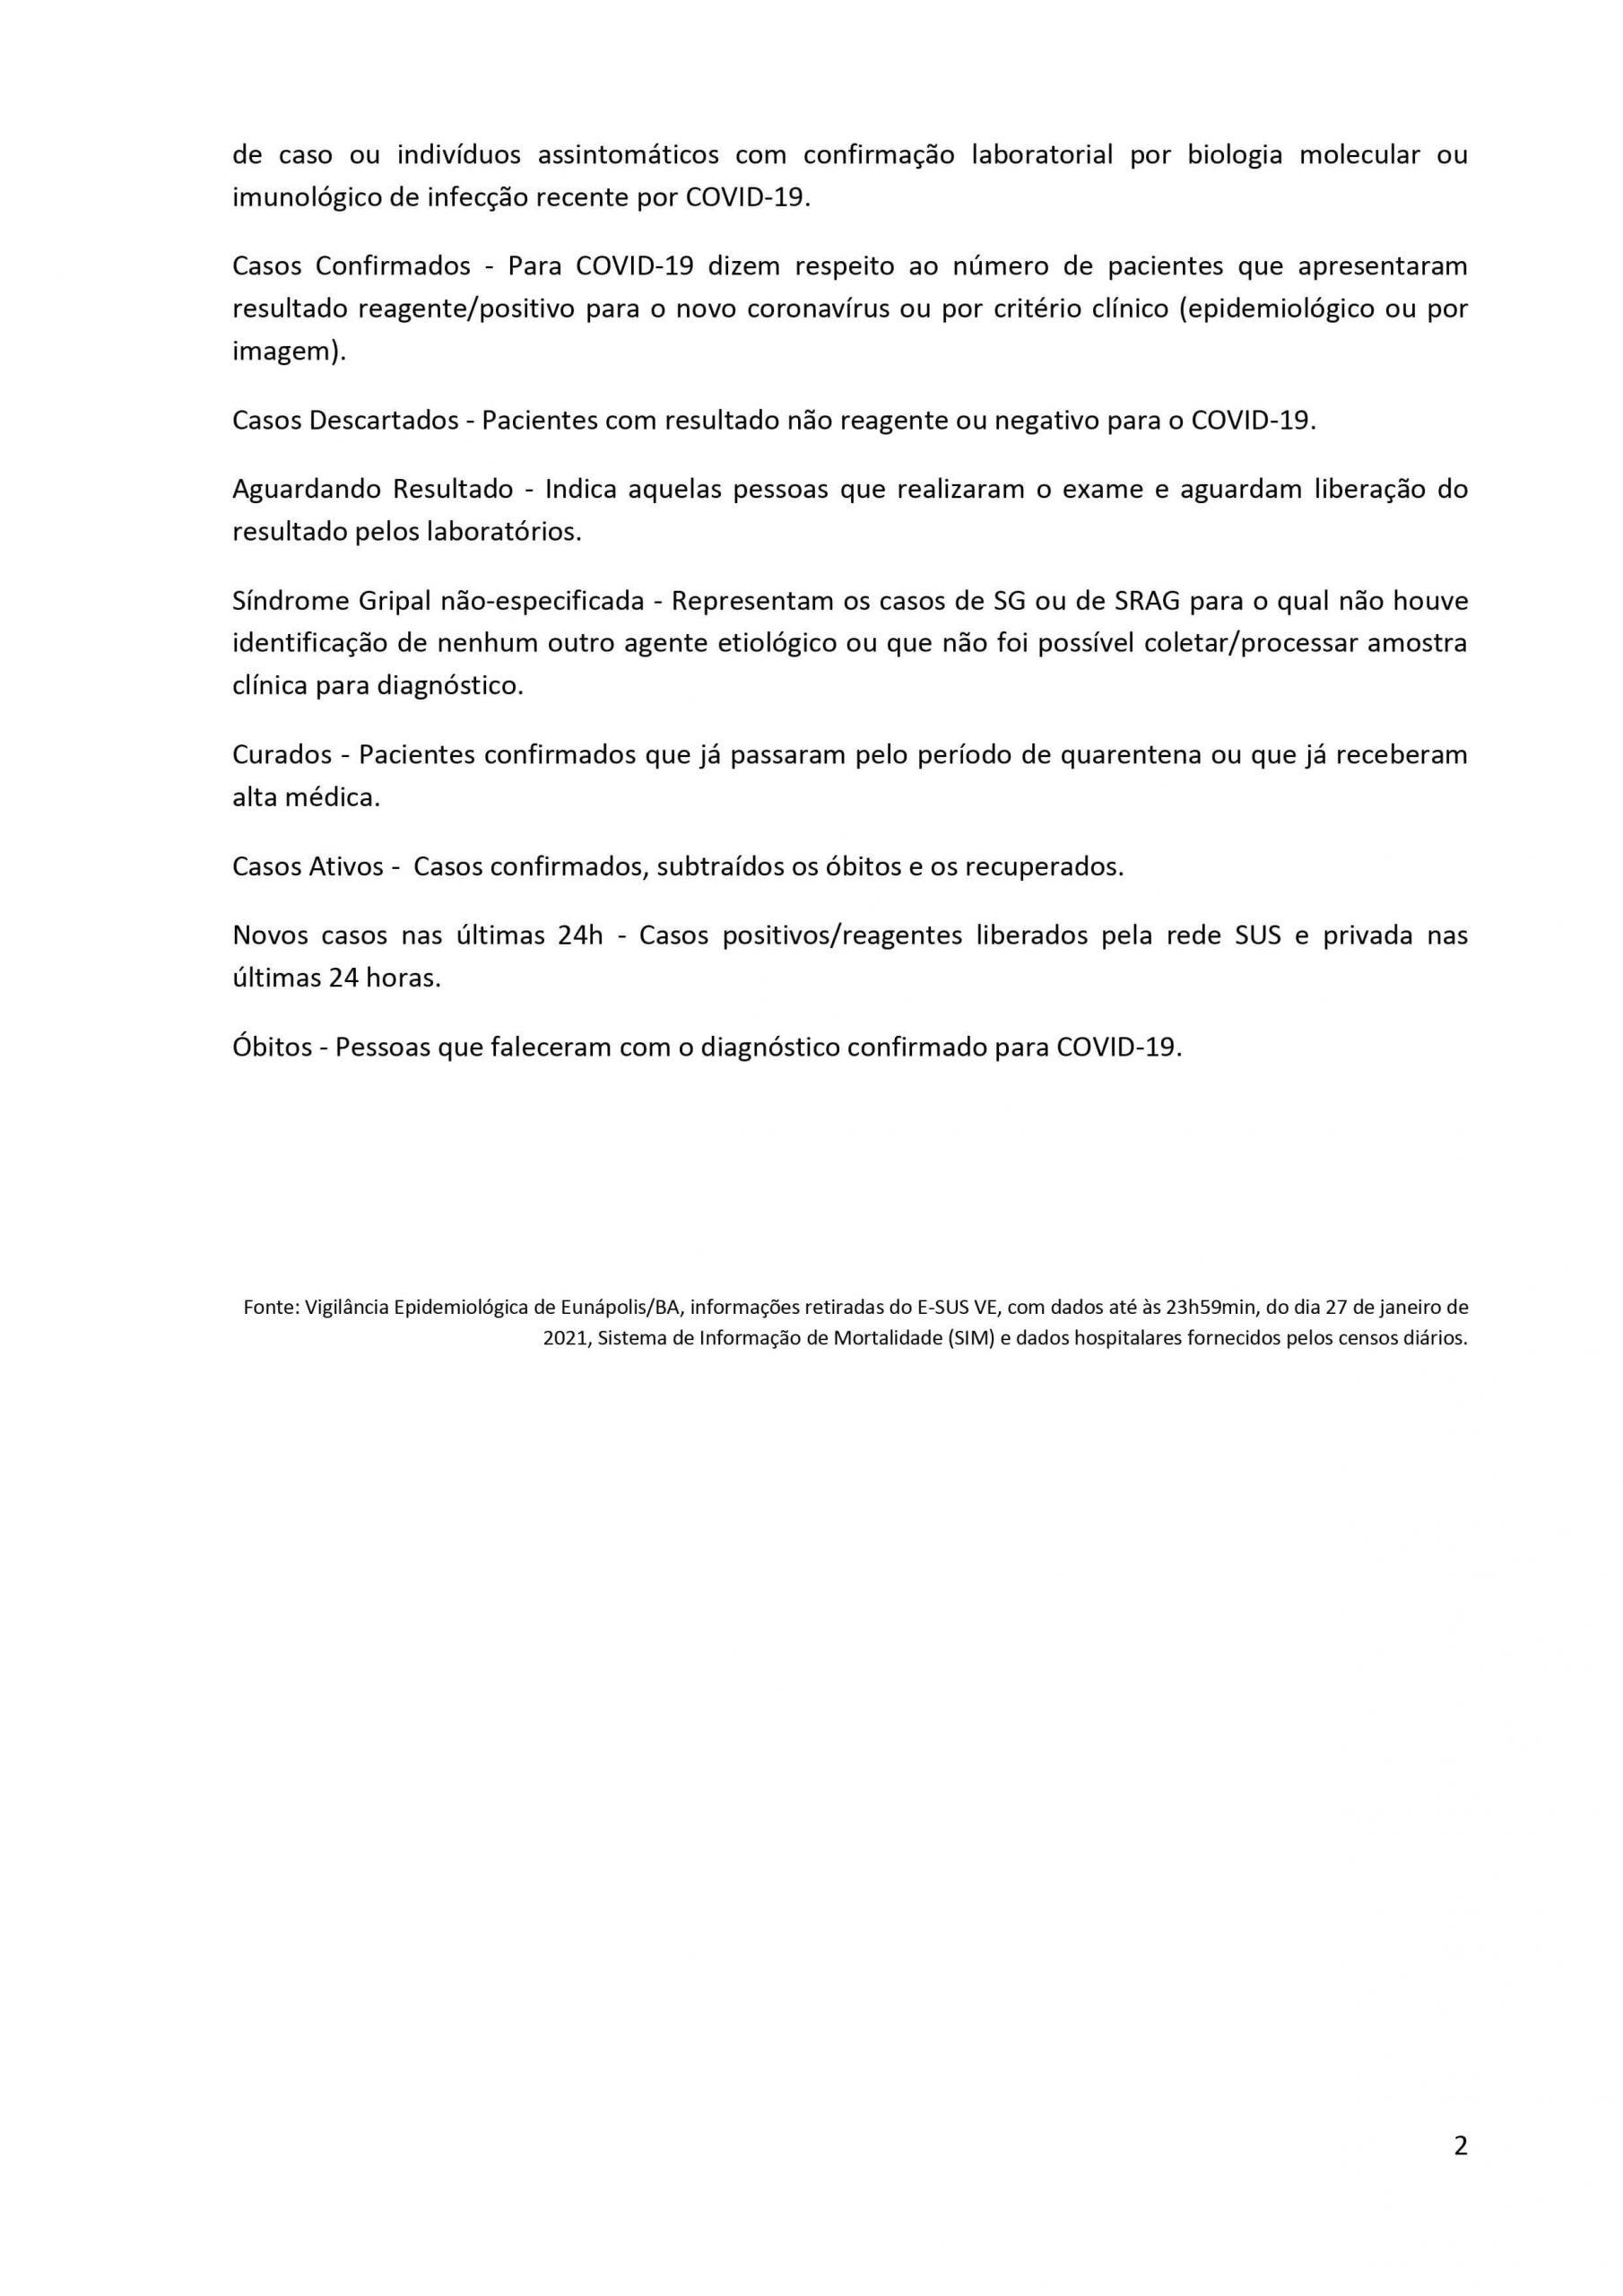 Boletim Epidemiológico Coronavírus do Município de Eunápolis para a data de hoje, 28/01/2021. 24